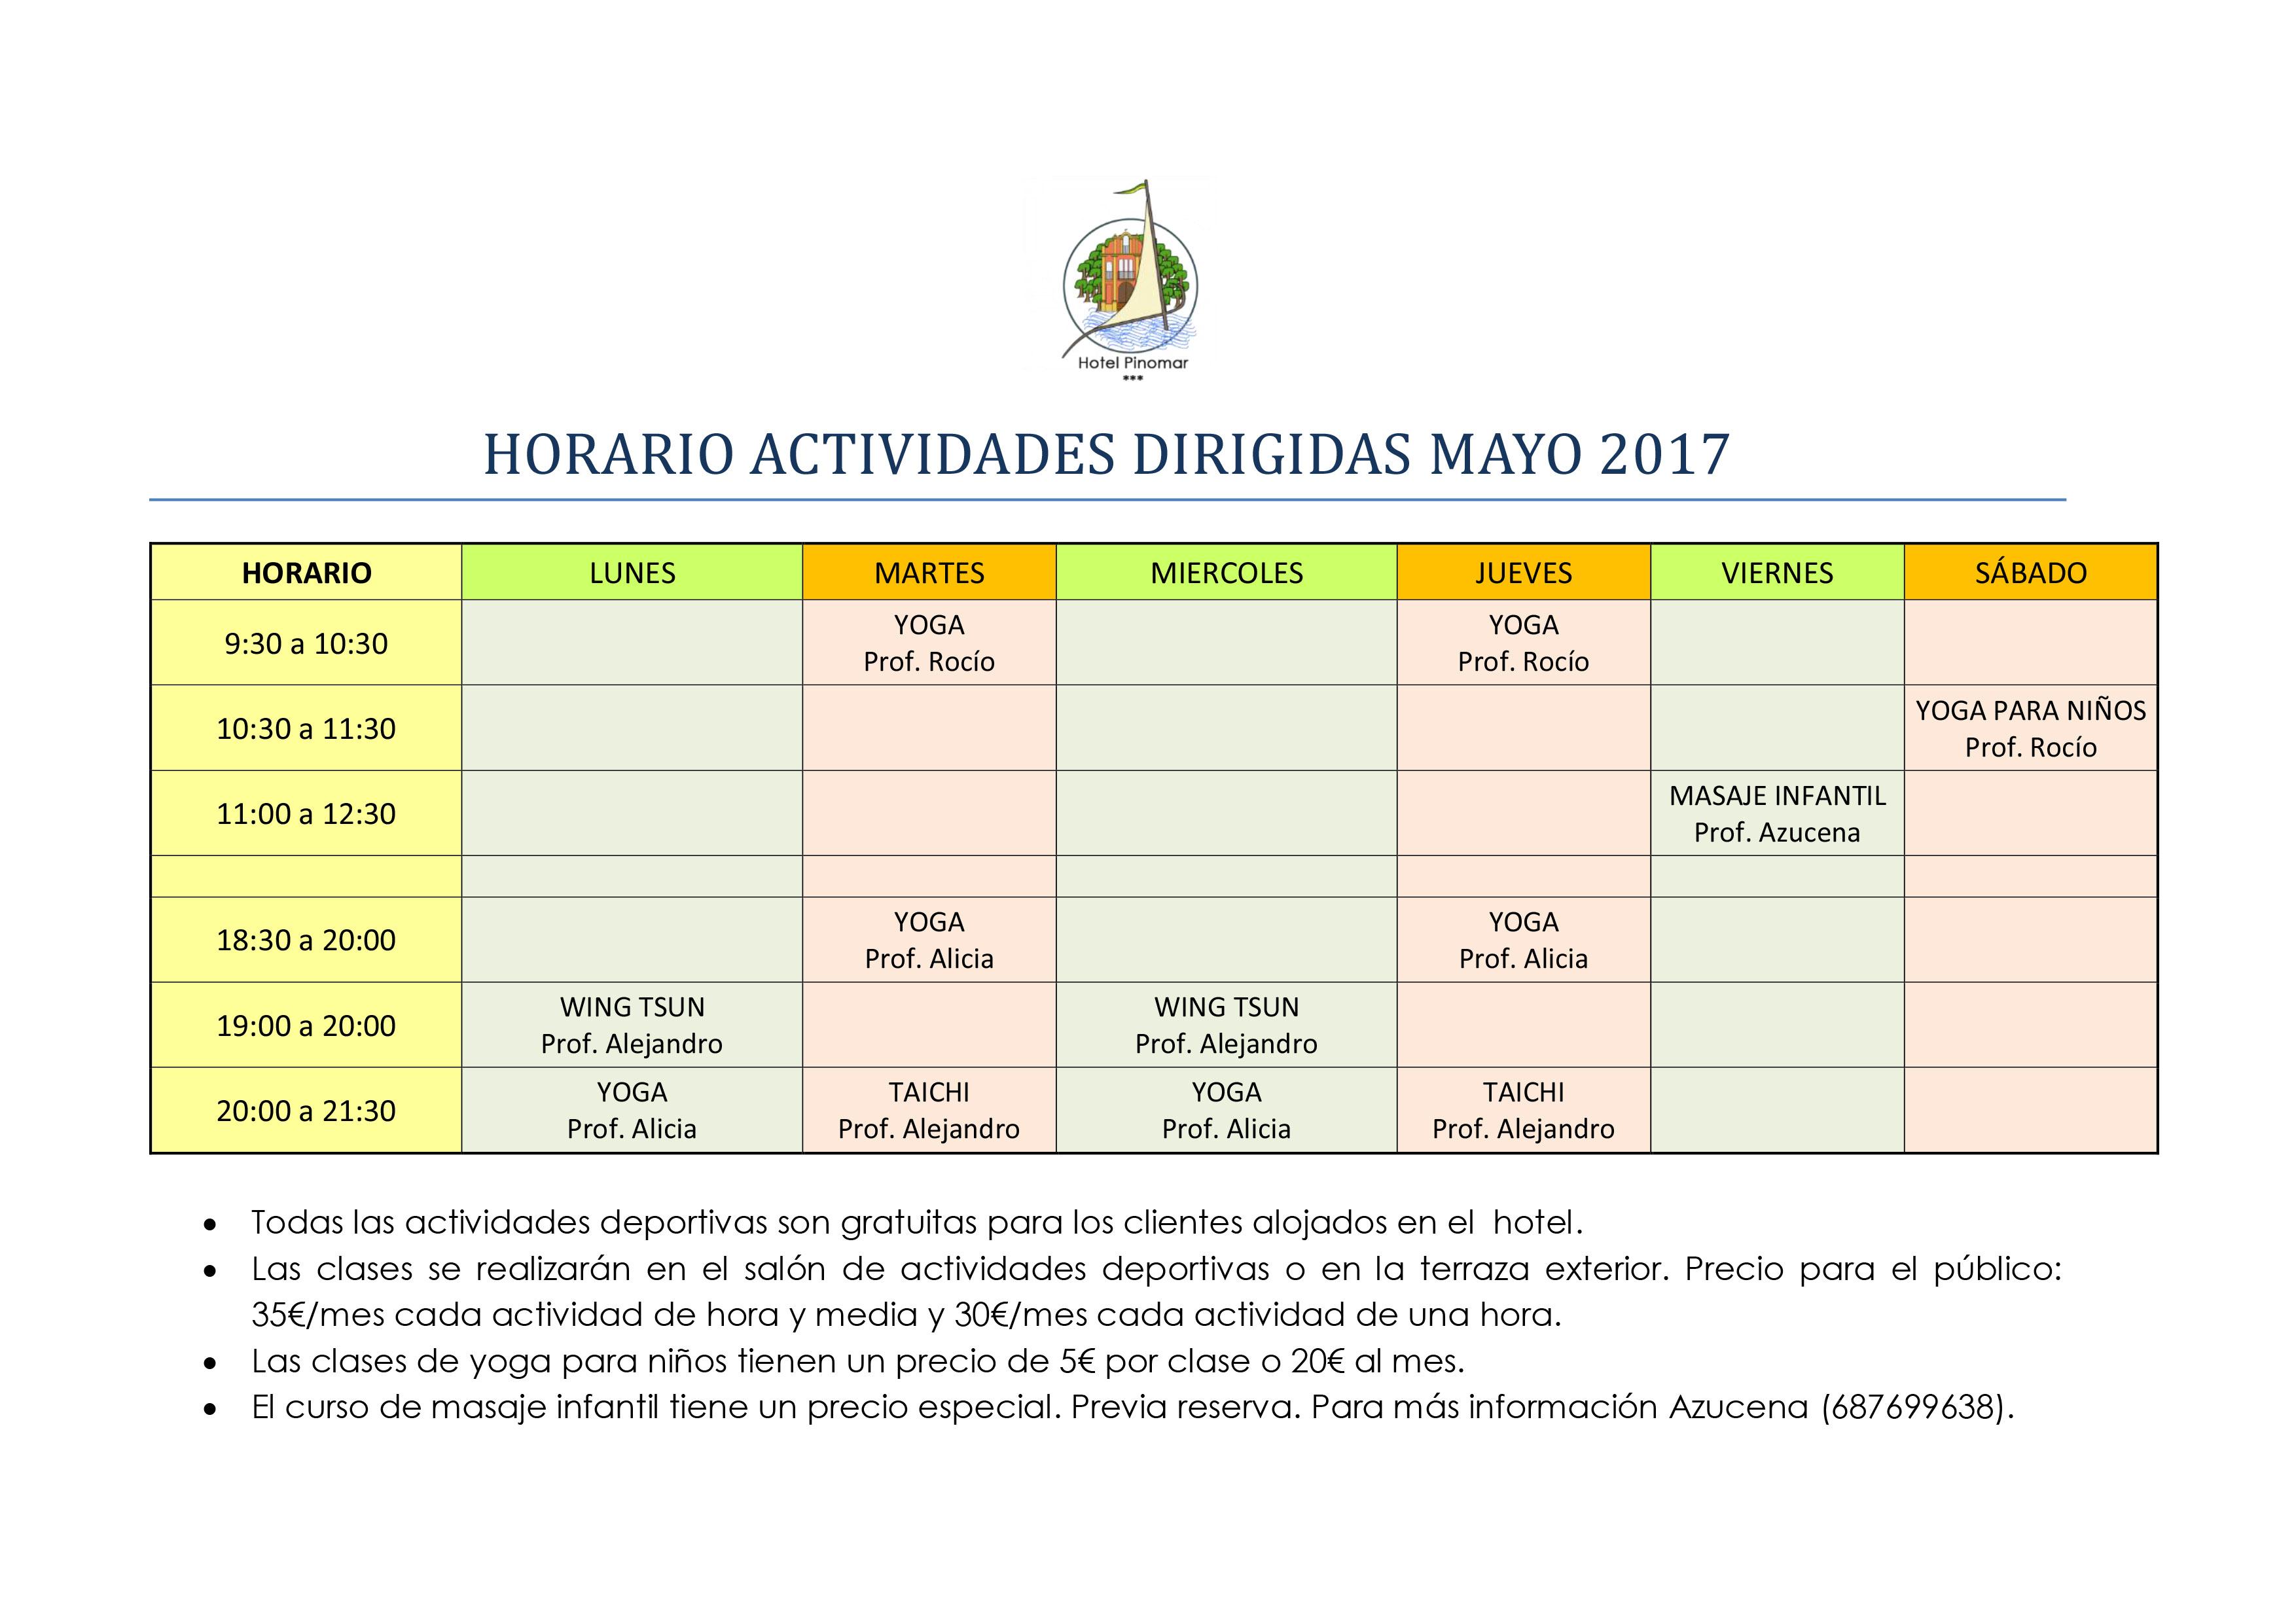 HORARIO SALA DEPORTIVA MAYO 2017